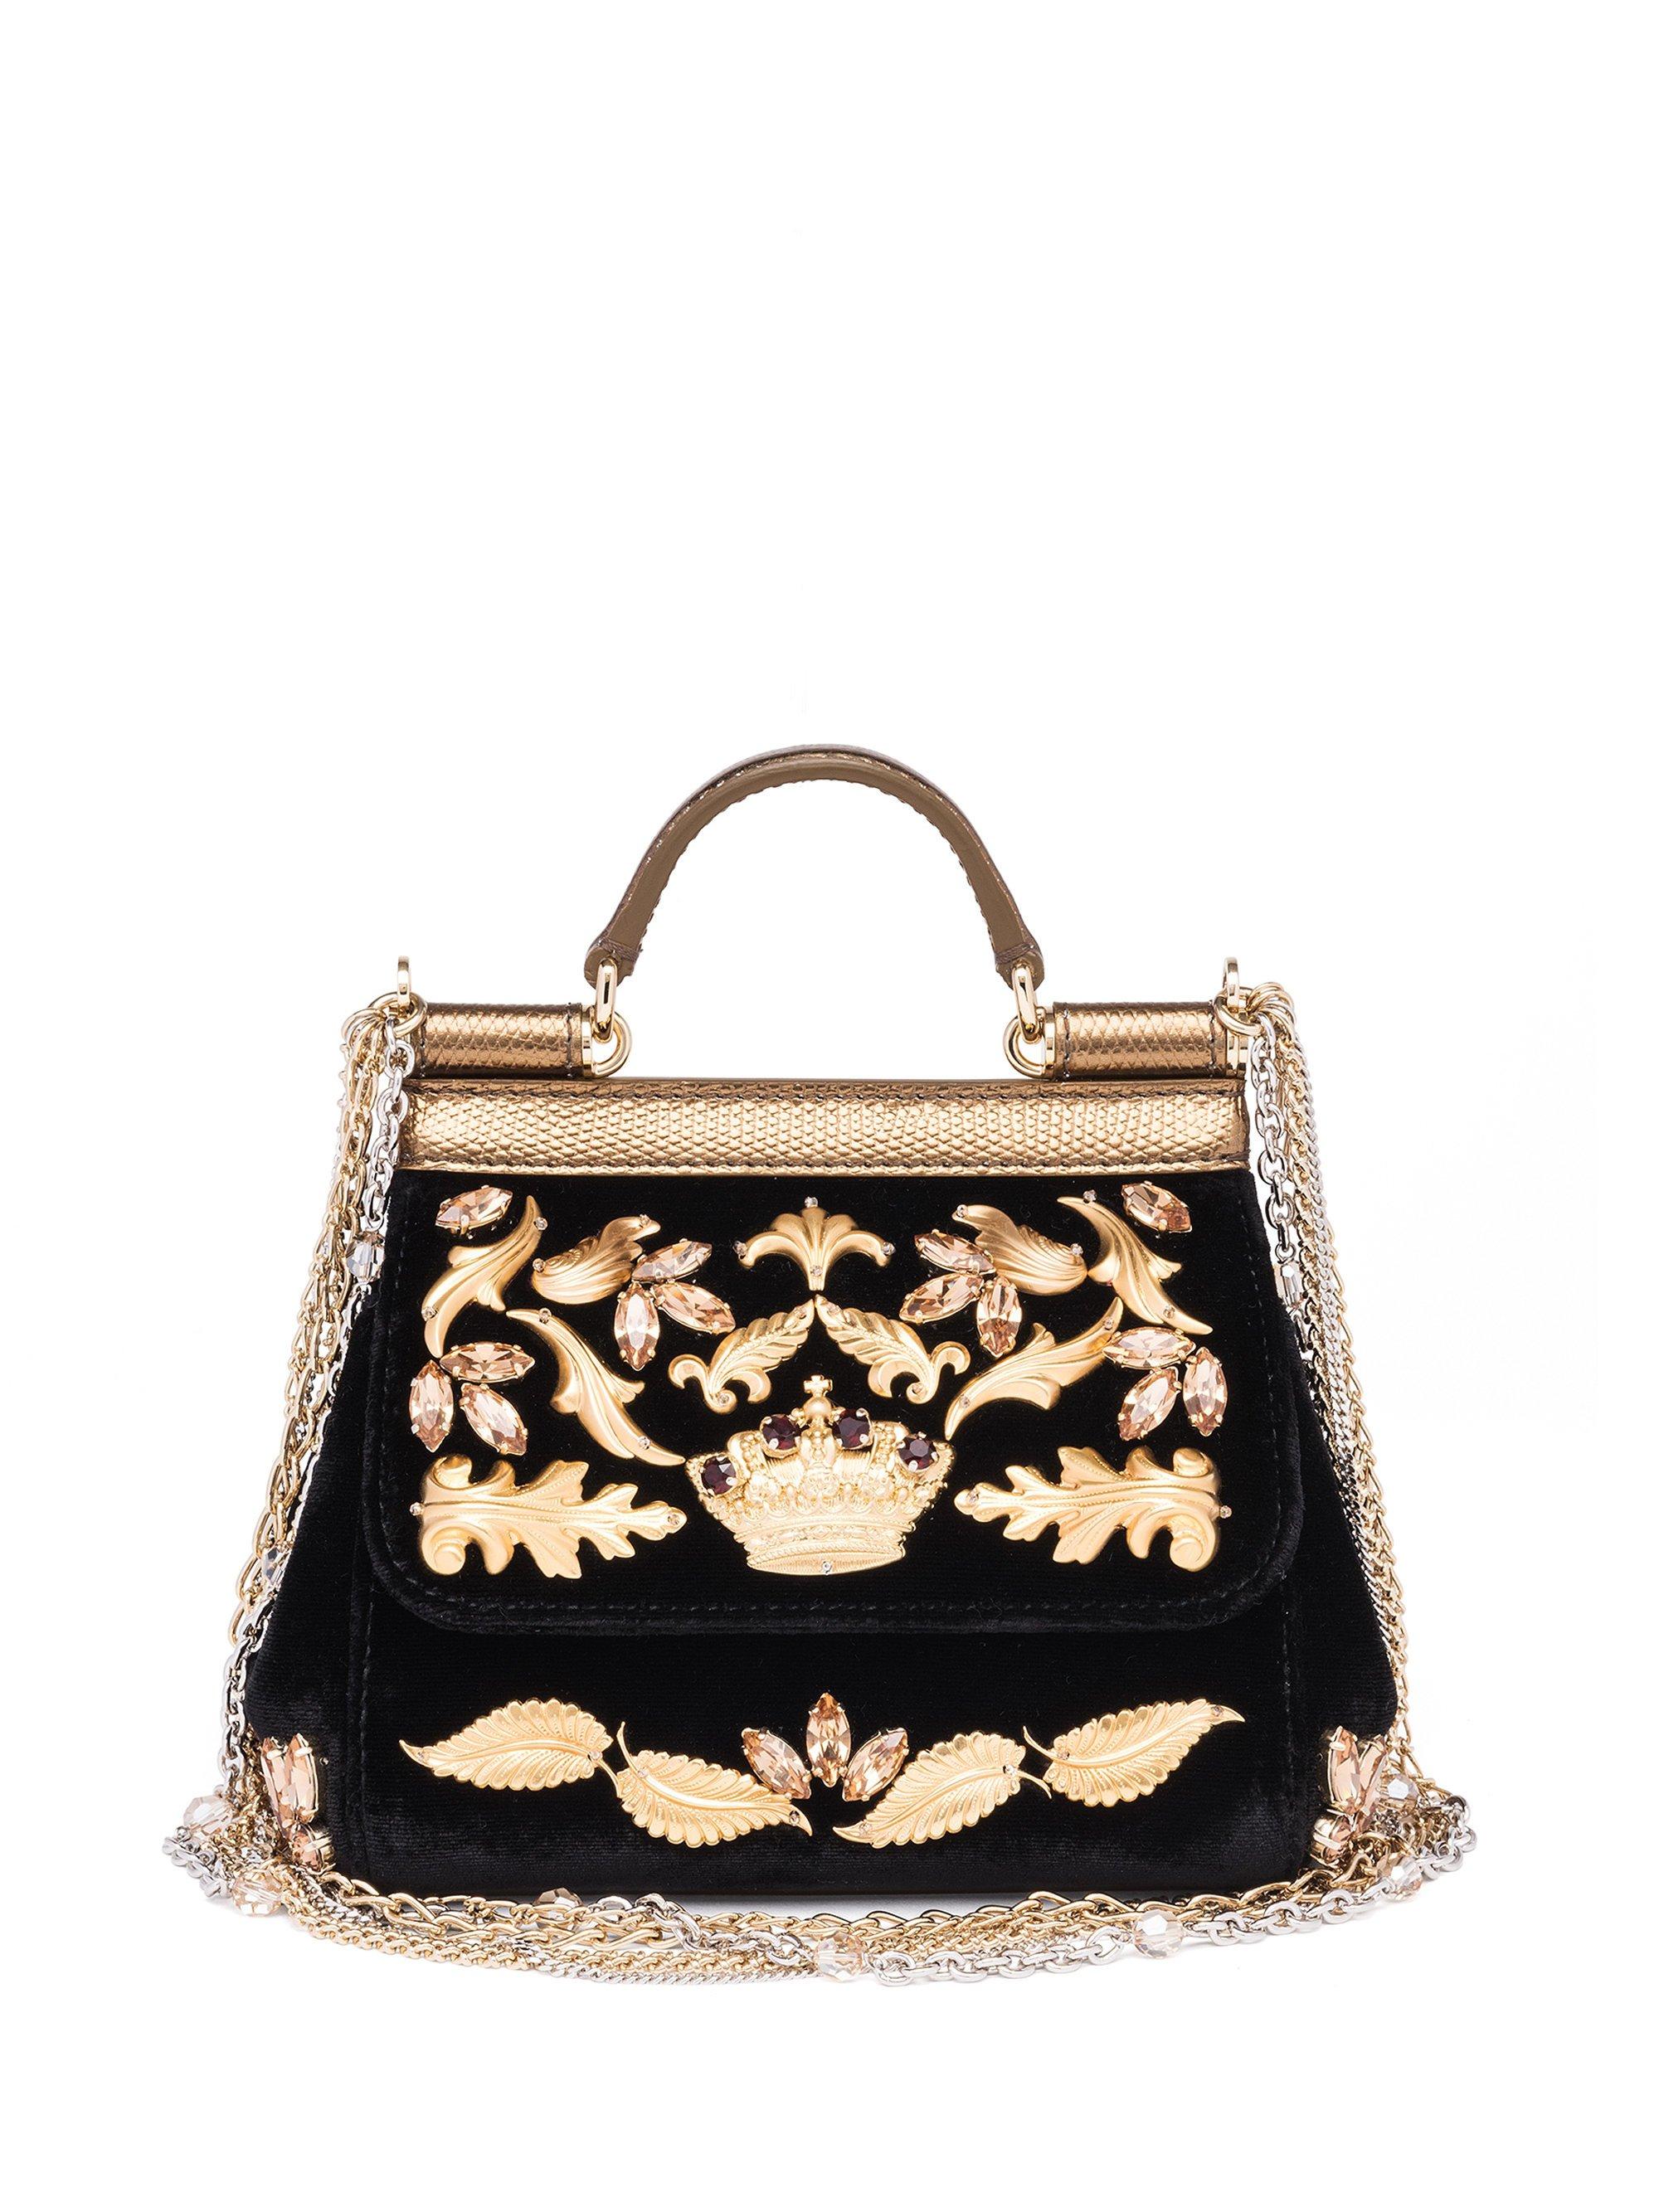 5c945afff622 Dolce And Gabbana Black Gold Purse - Best Purse Image Ccdbb.Org